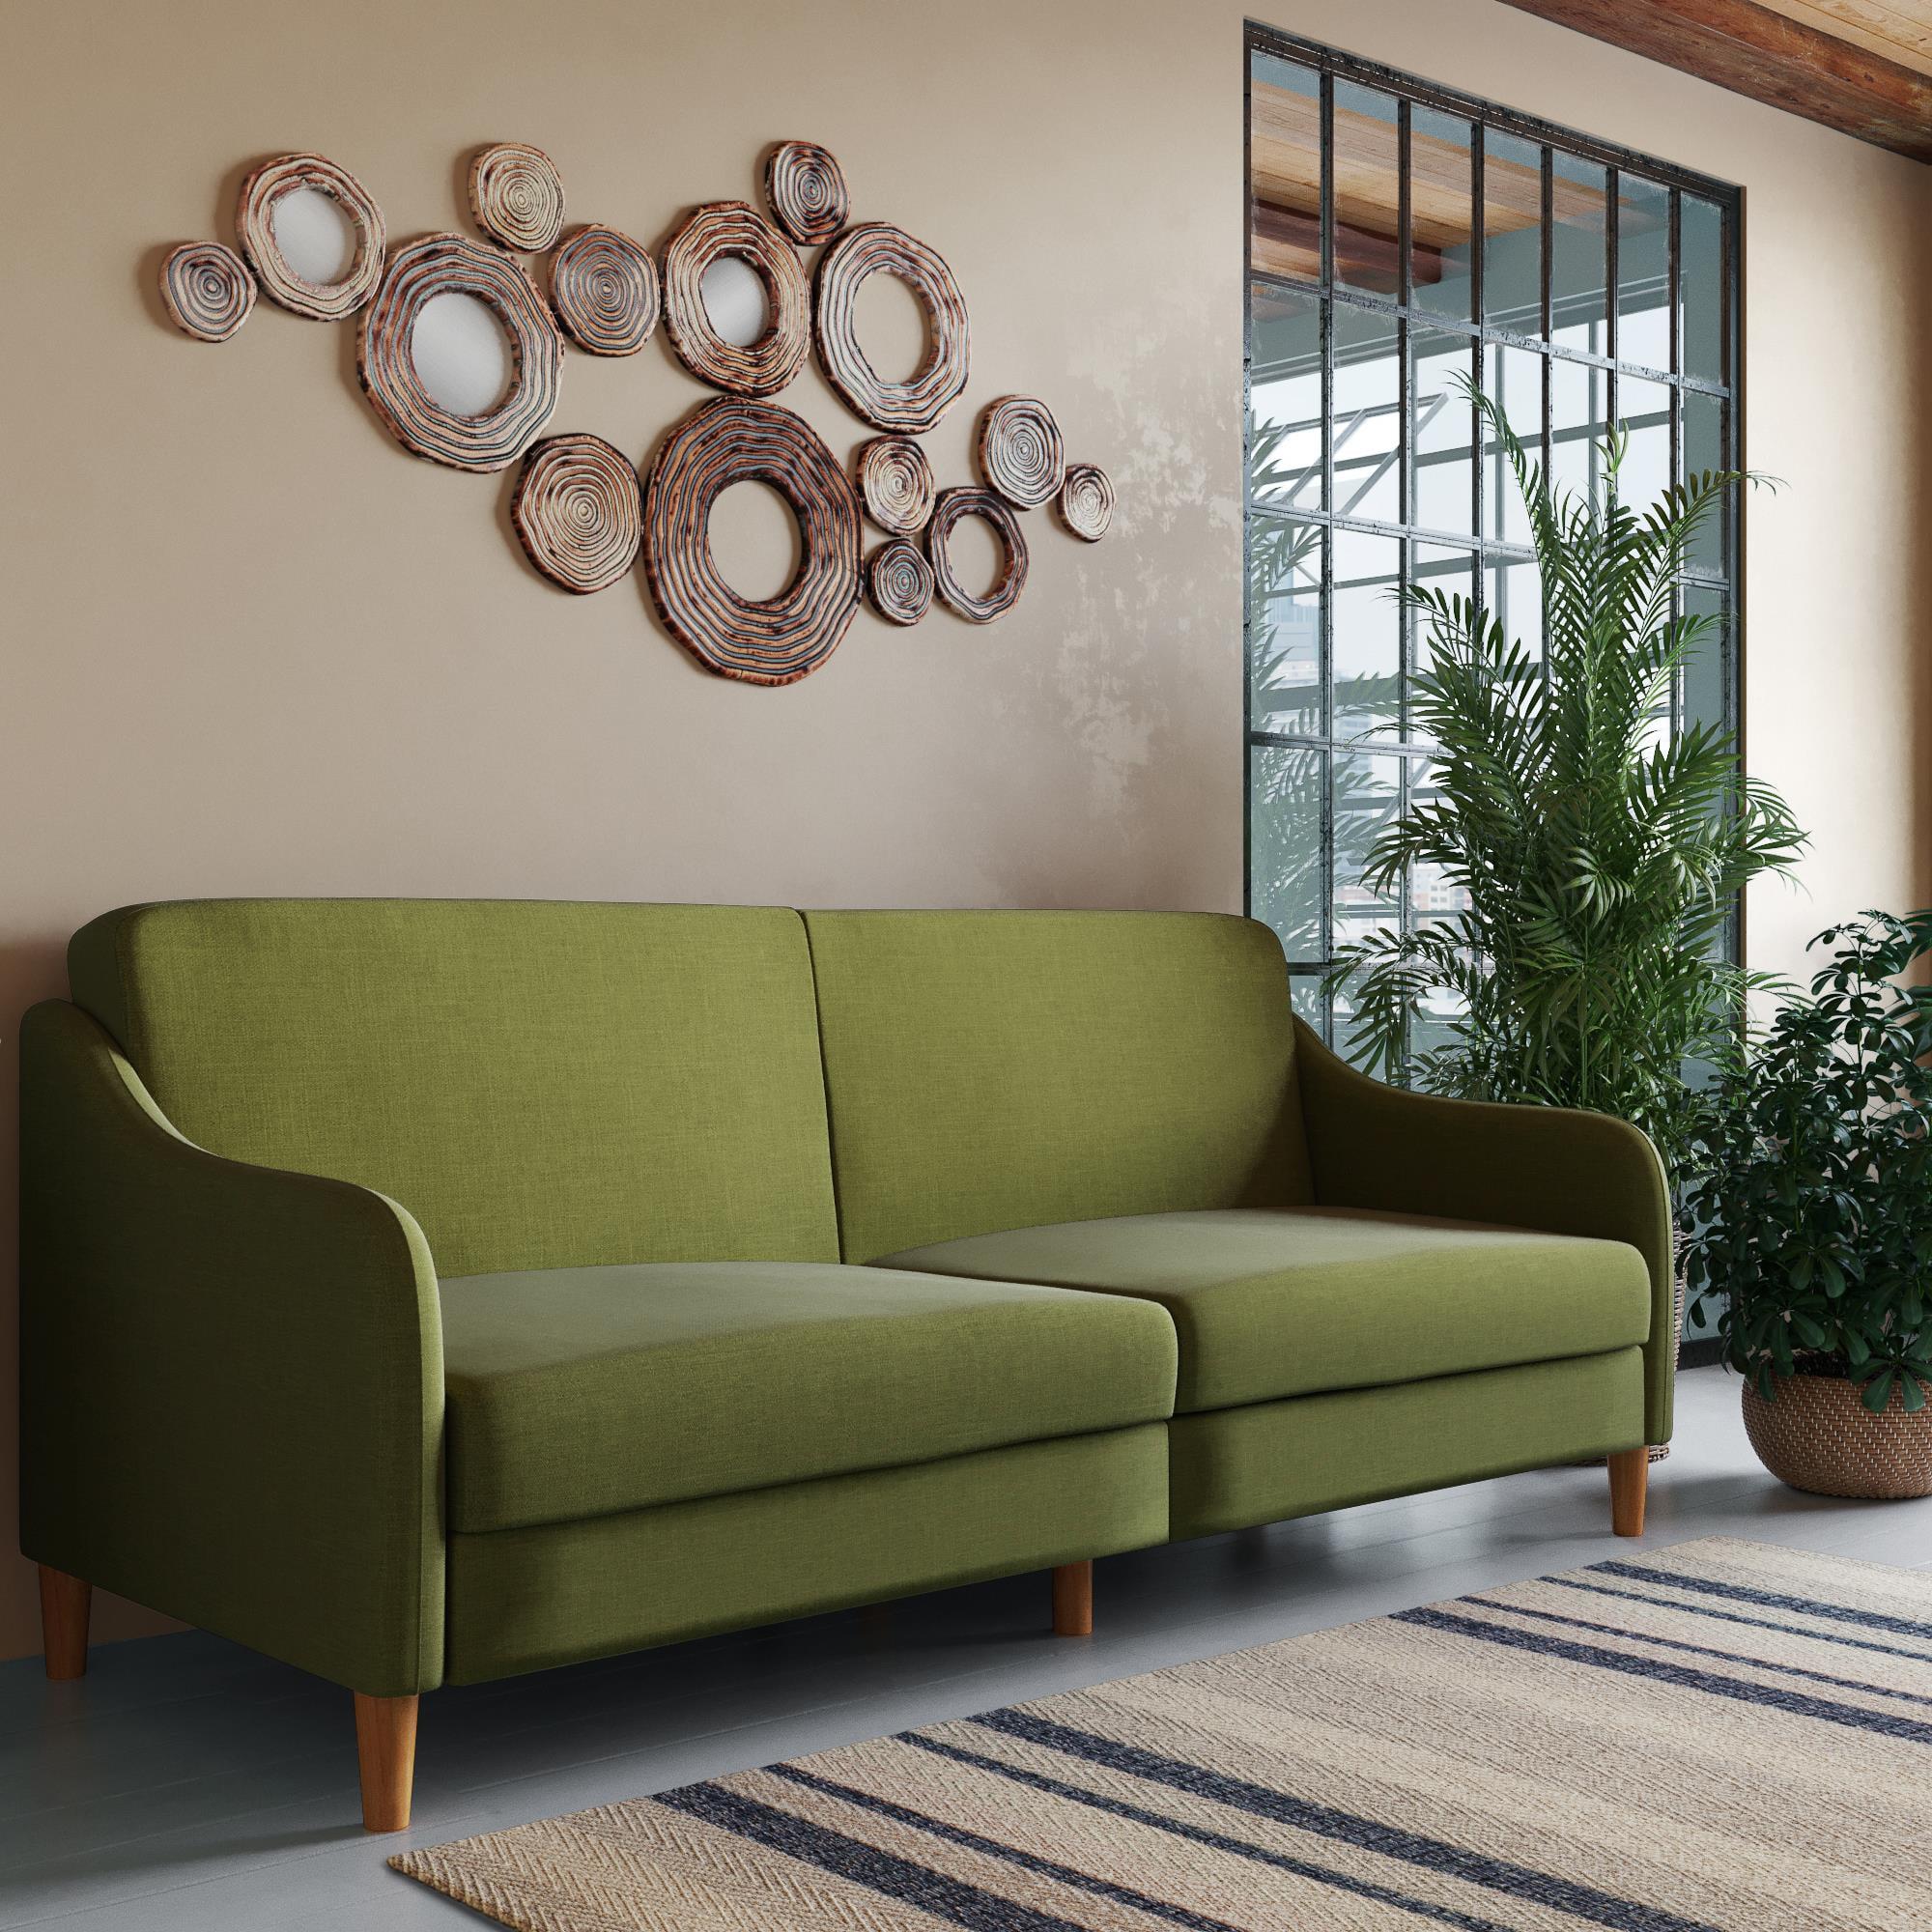 Sensational Dhp Jasper Coil Sofa Bed Gray Walmart Com Andrewgaddart Wooden Chair Designs For Living Room Andrewgaddartcom